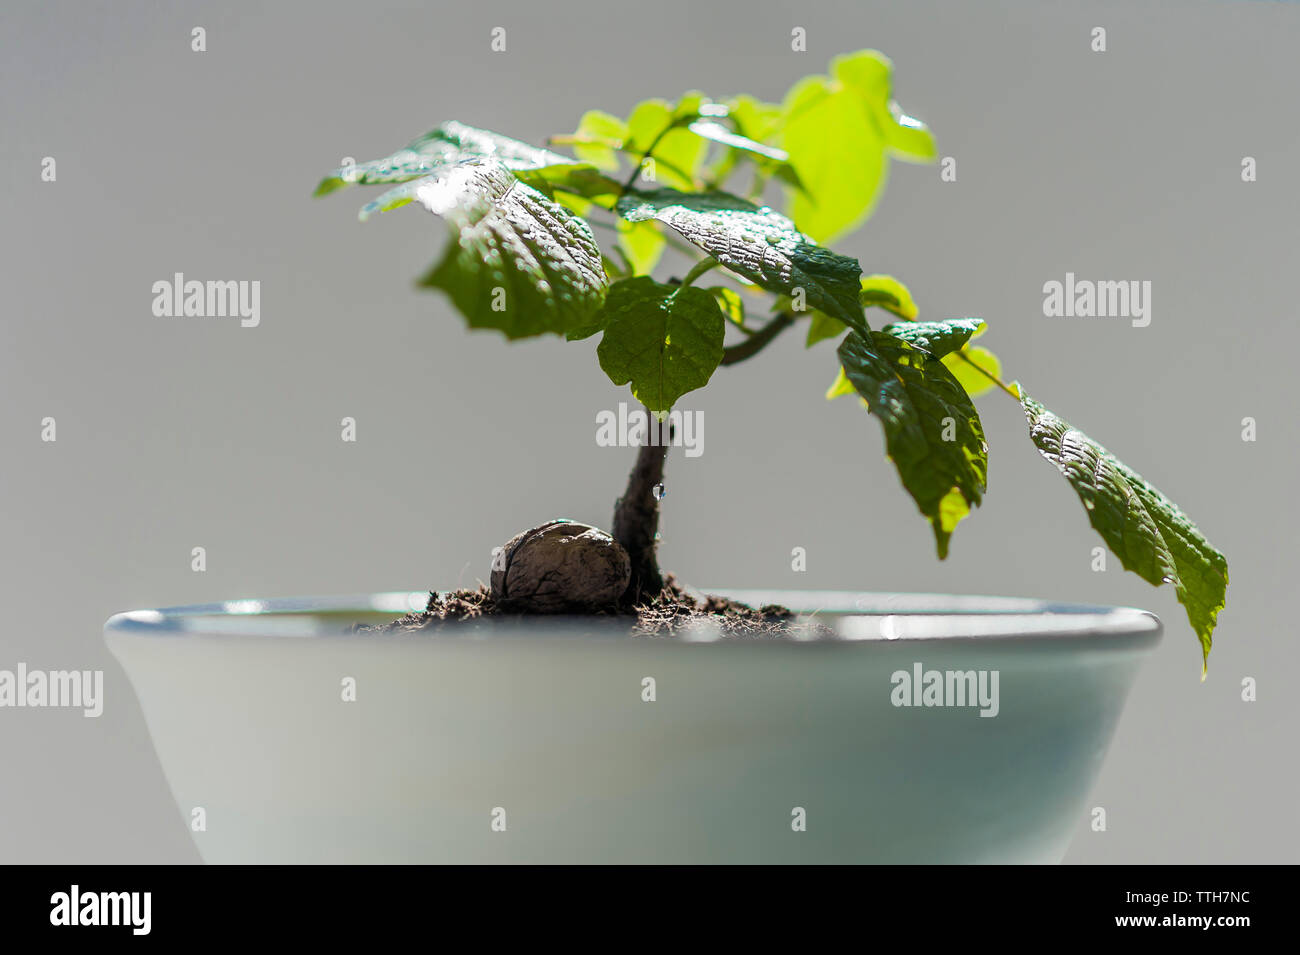 Small Baby Walnut Tree In Bonsai Pot Stock Photo Alamy